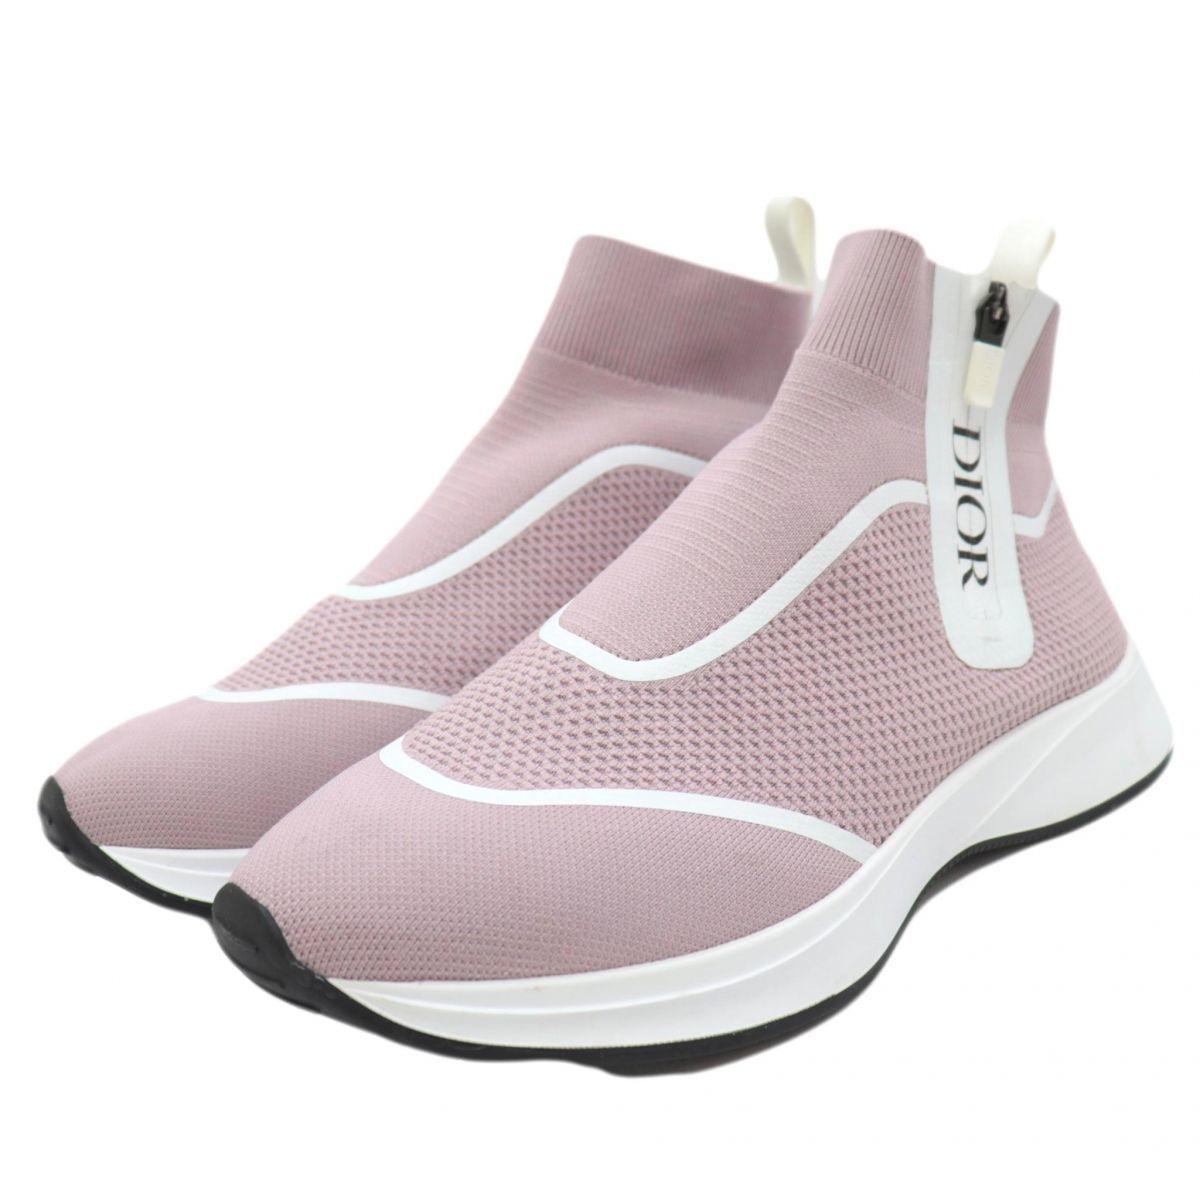 Christian Dior Dior Men B25 High Top Knit Sneakers Men's Pink 43 Logo Side Zip DIOR MEN